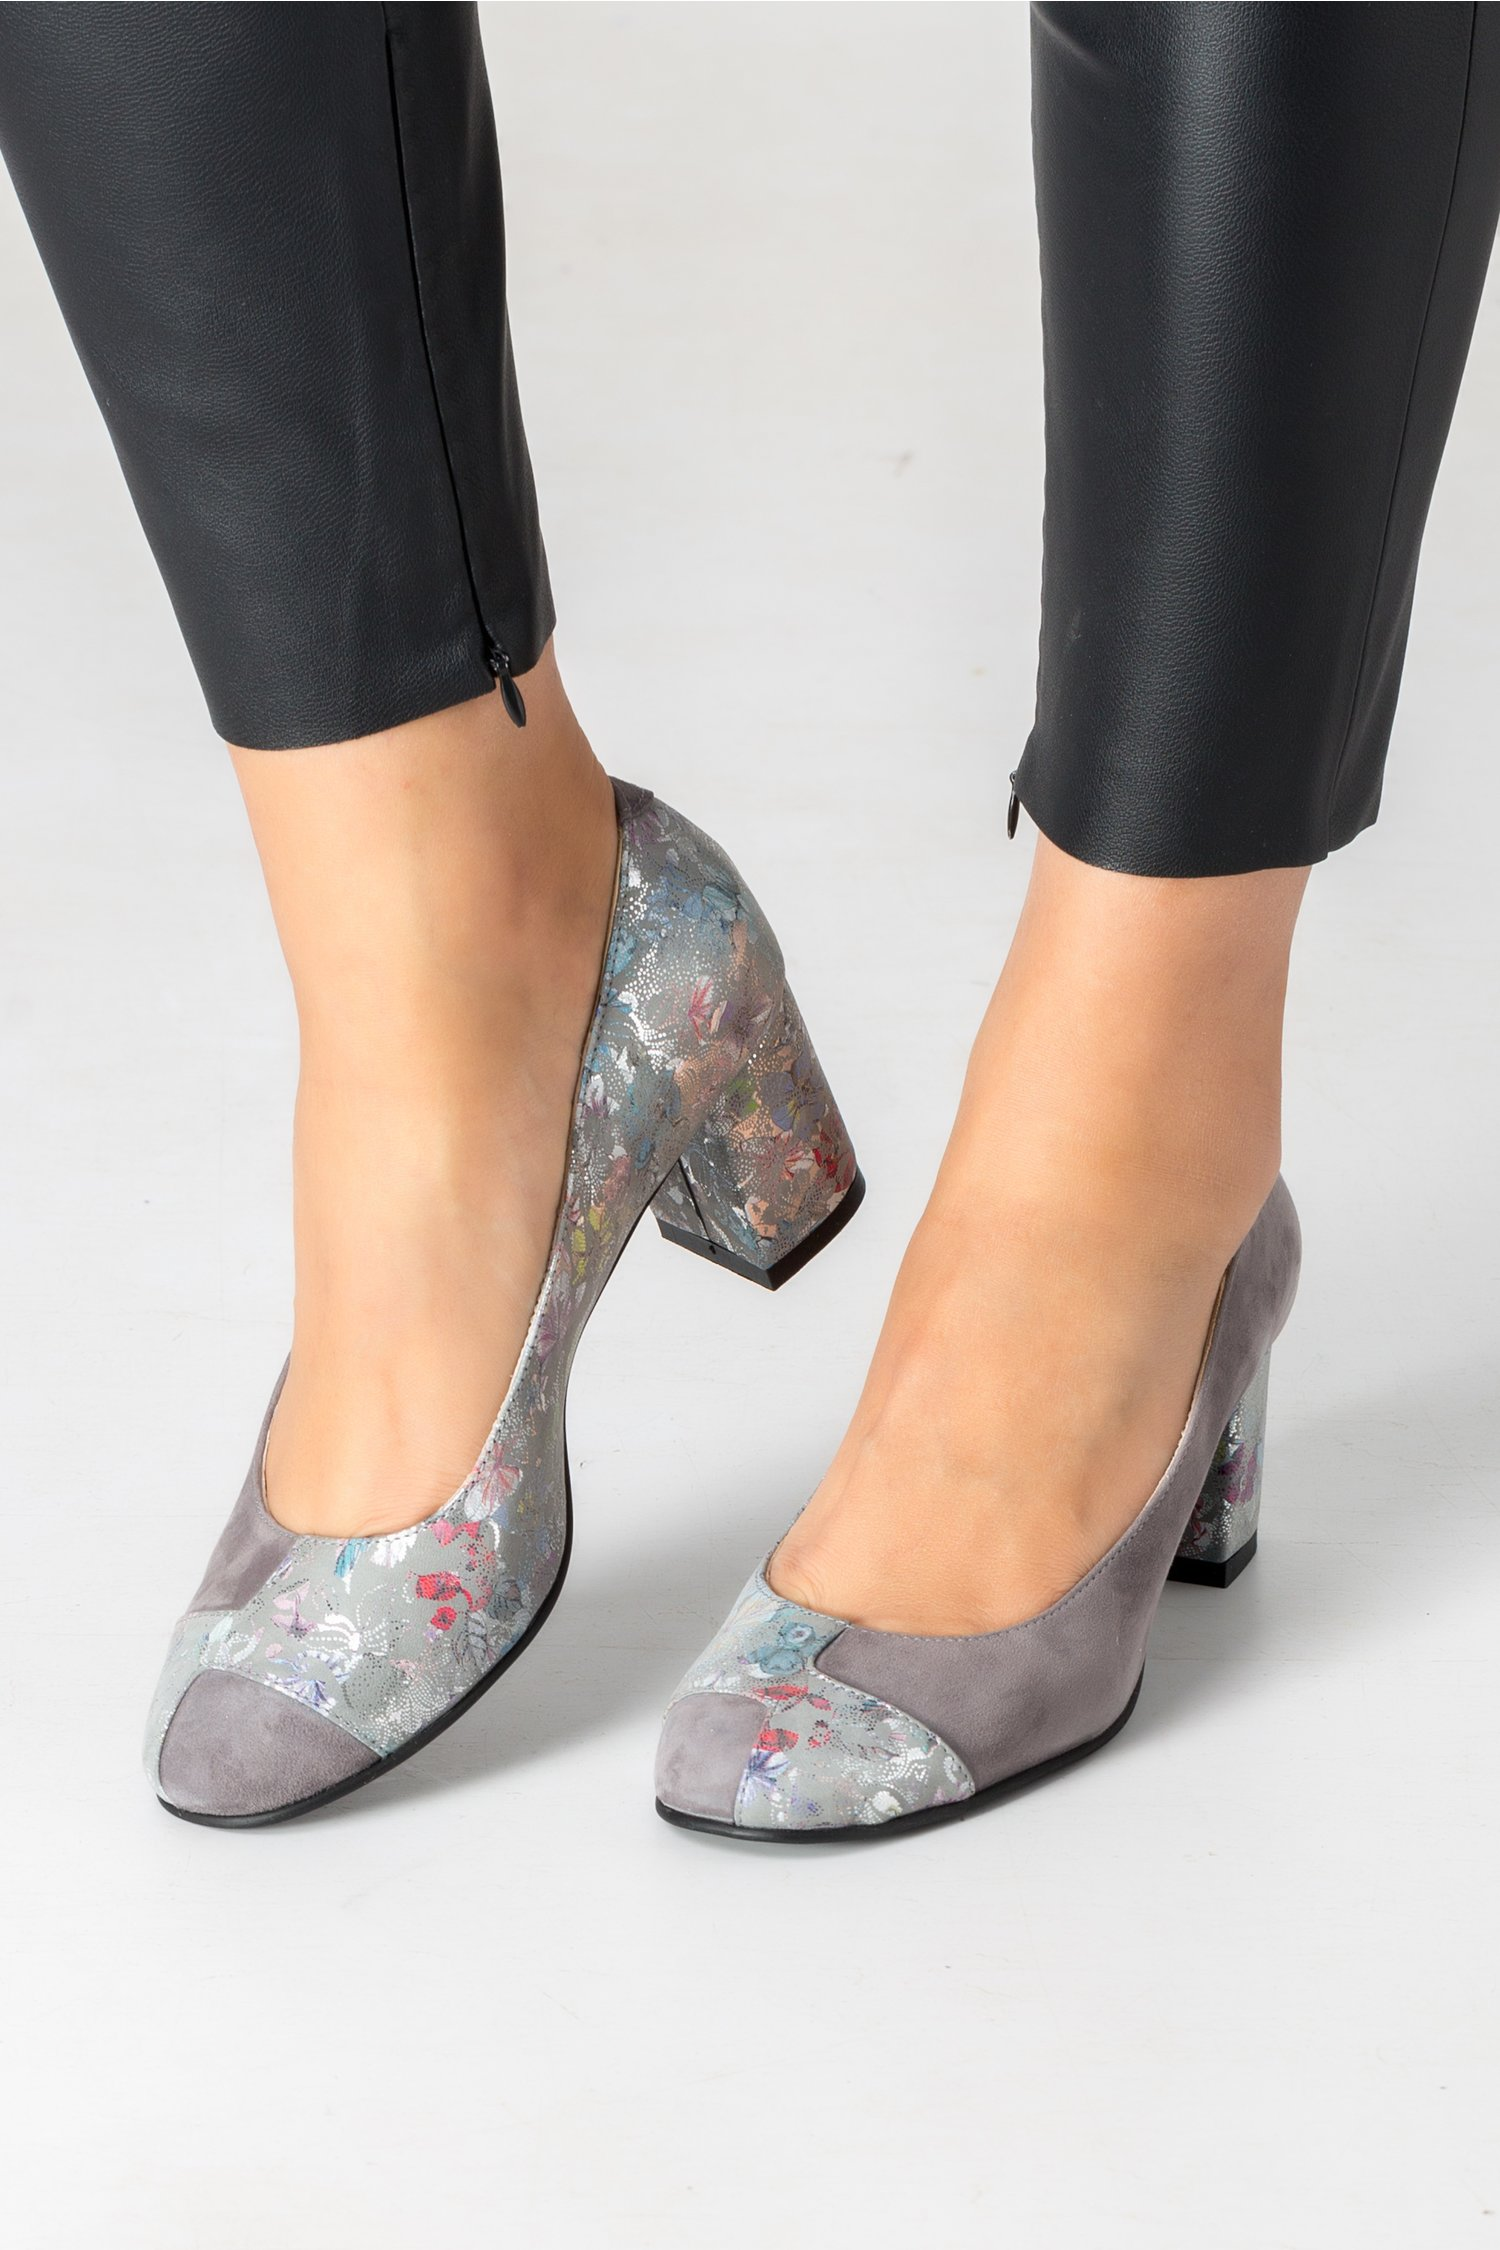 Pantofi gri cu imprimeu floral